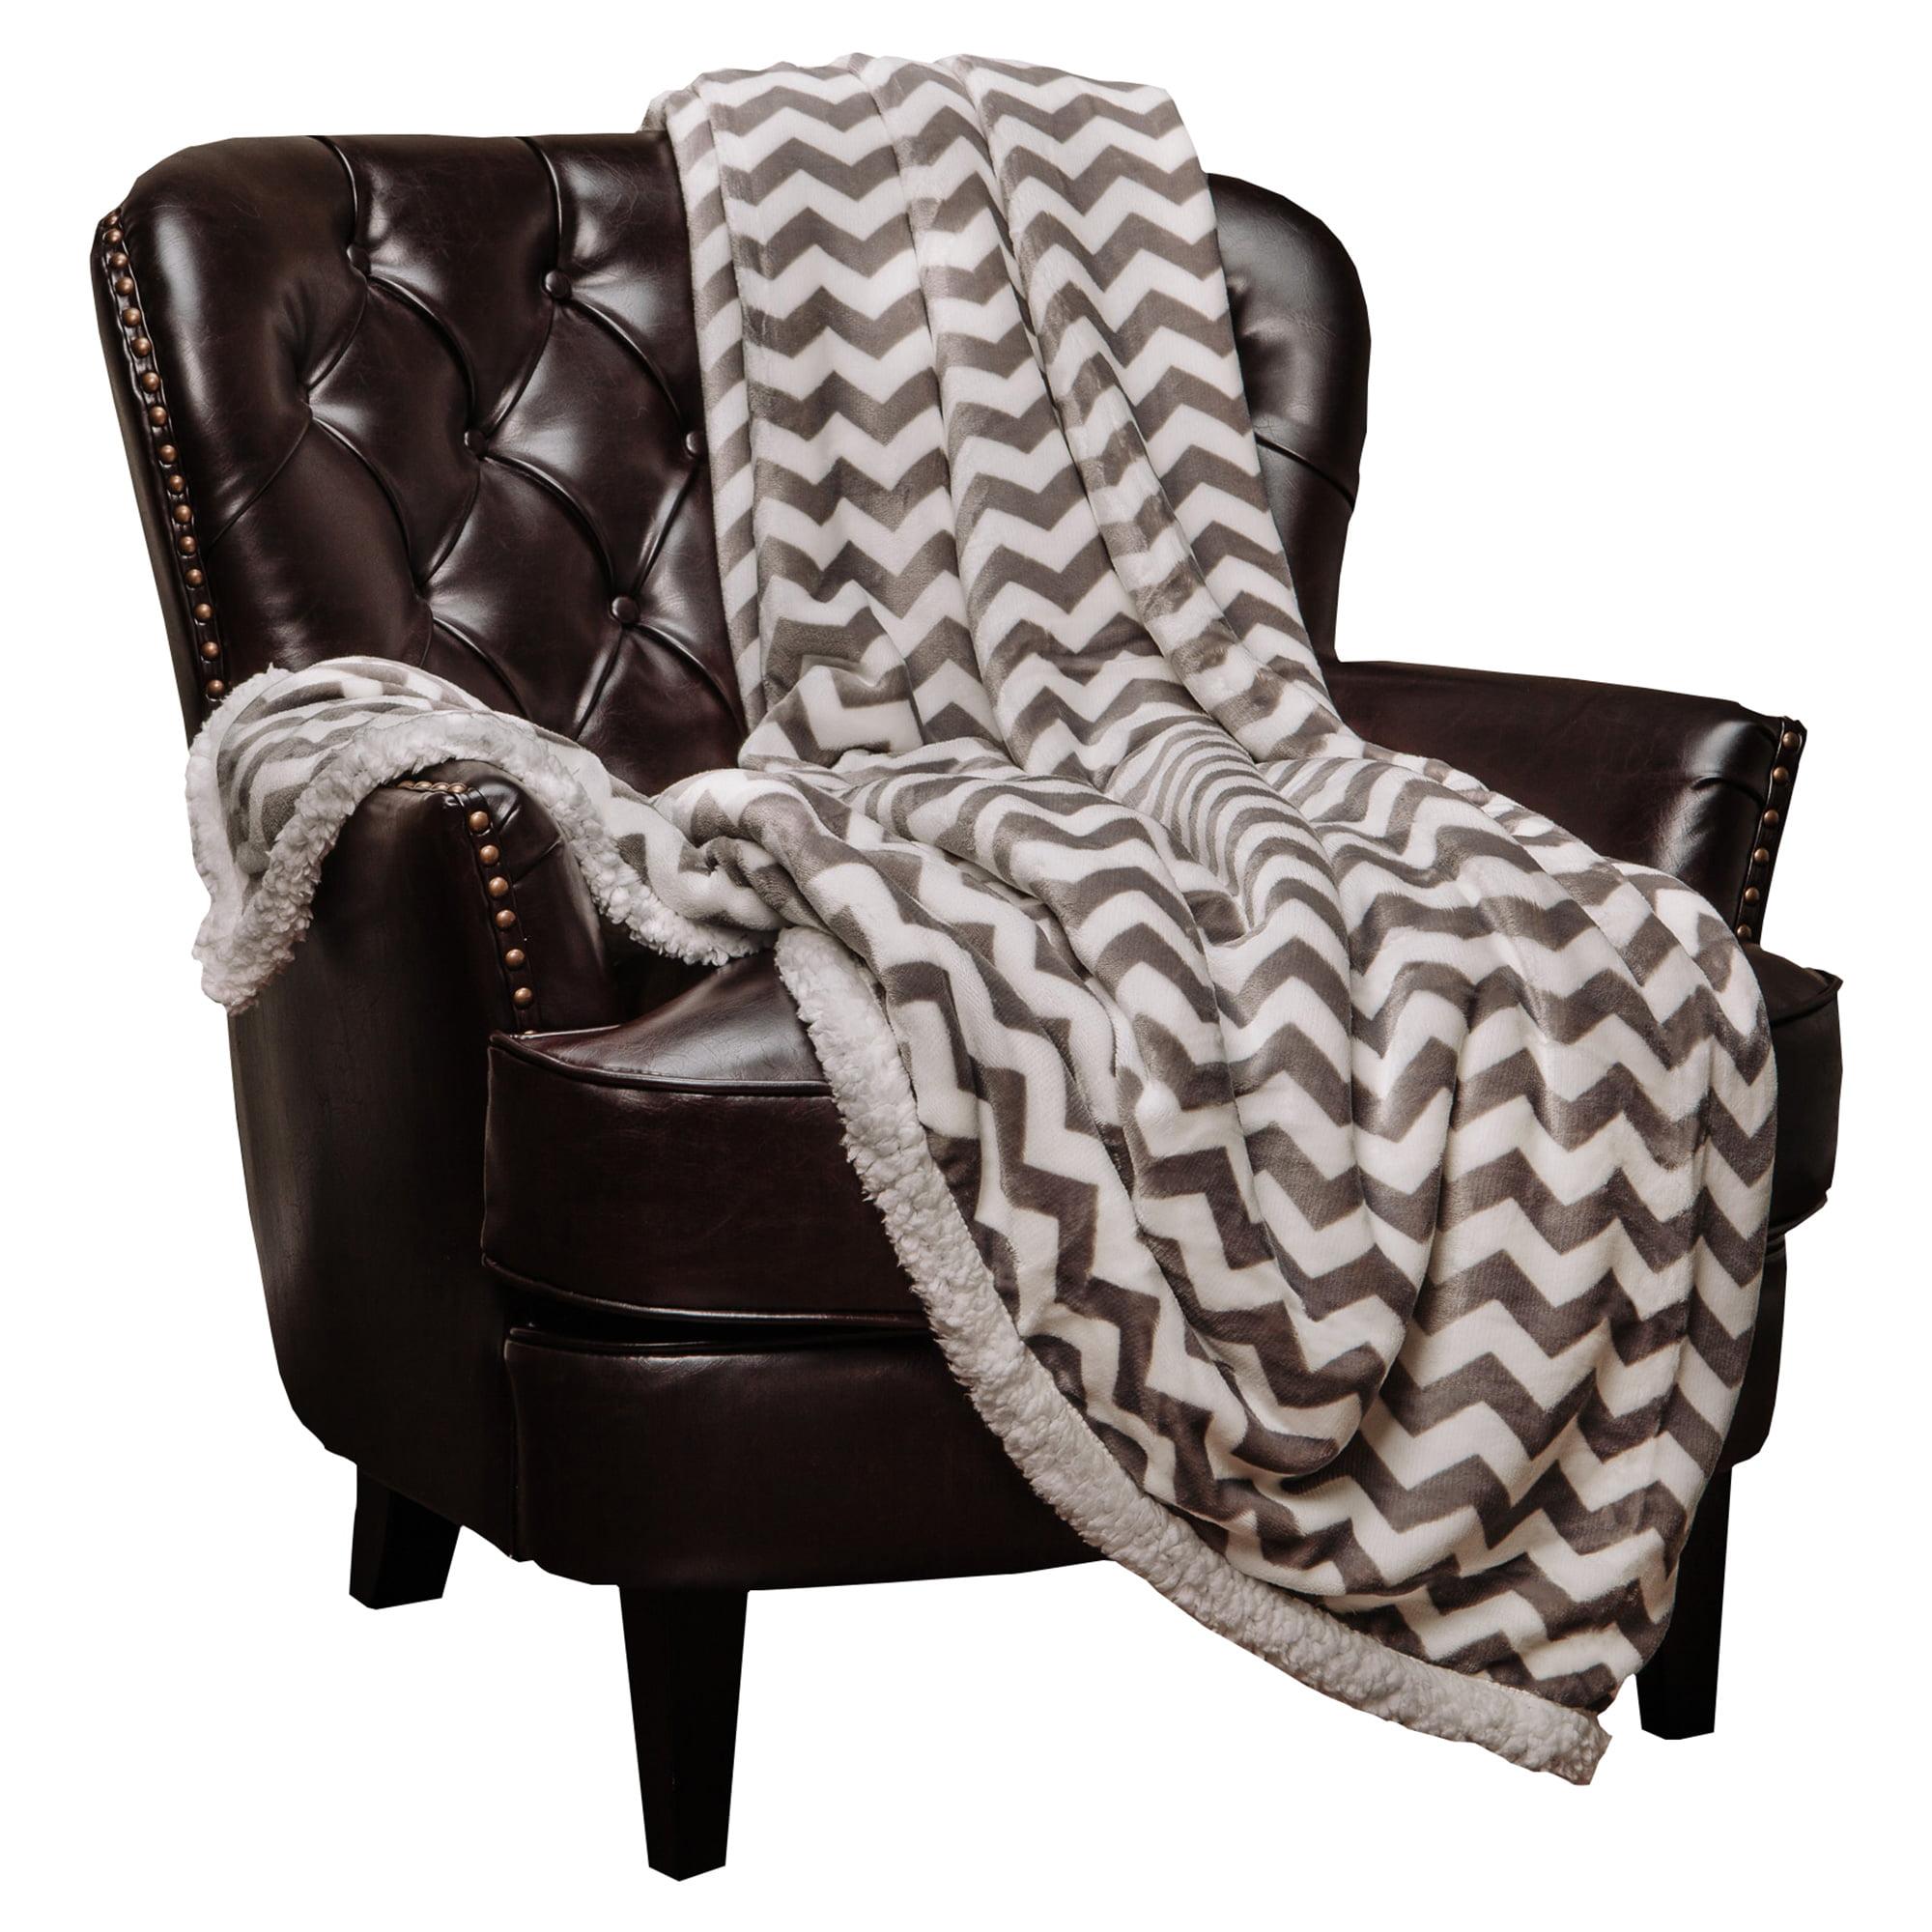 Chanasya Super Soft Sherpa Chevron Throw Blanket by Purchase Corner LLC